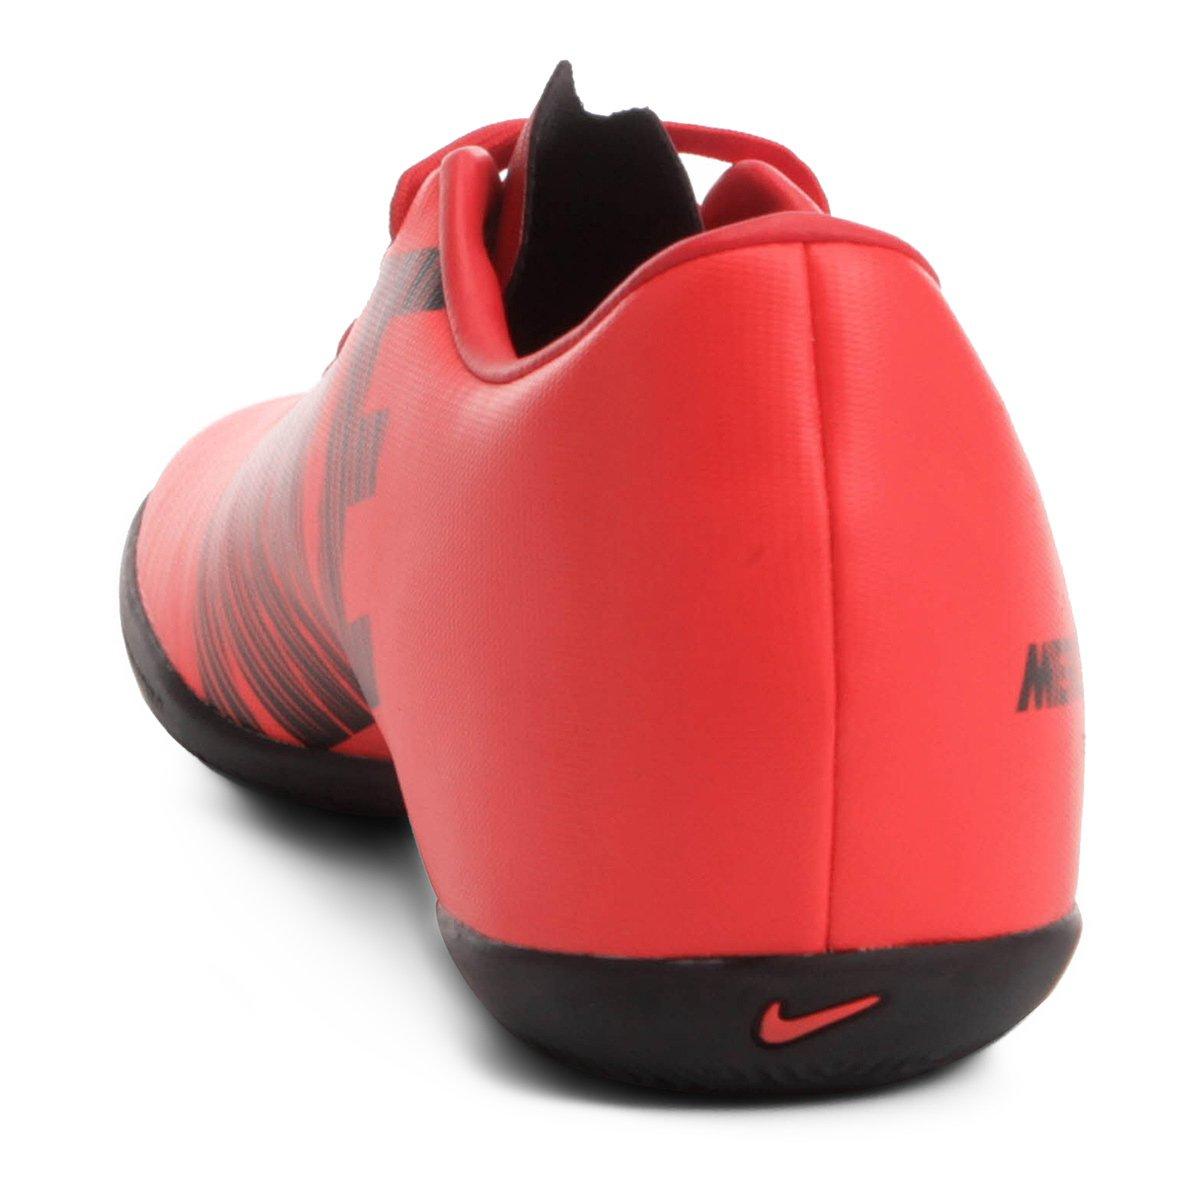 df4d9d4d8e Chuteira Futsal Nike Mercurial Victory 6 IC - Compre Agora